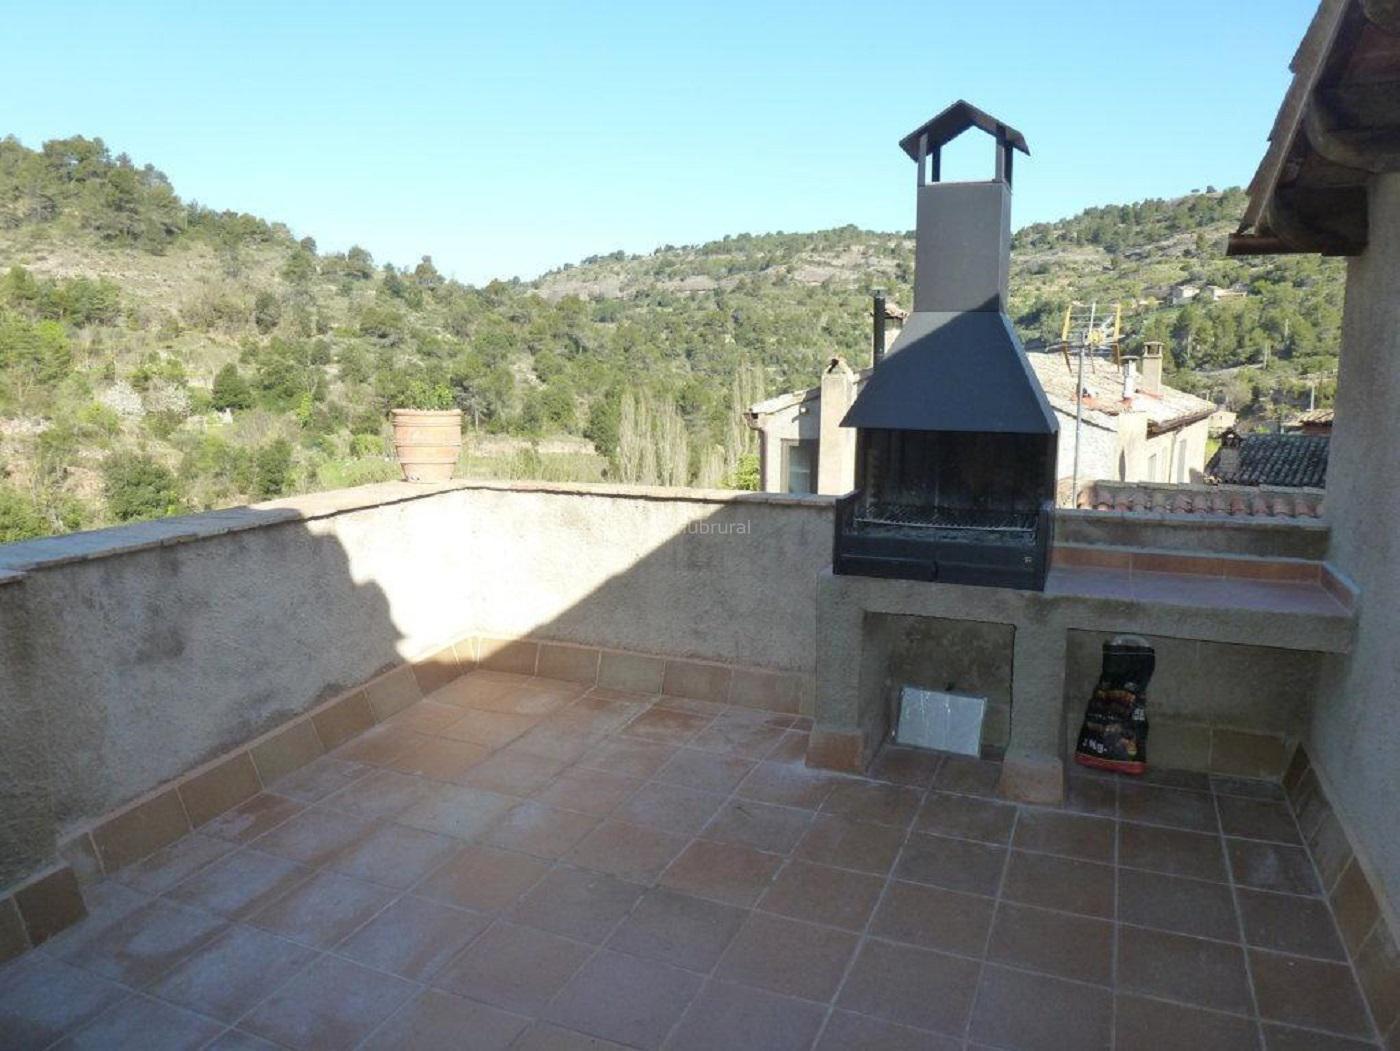 Fotos de cal vidal barcelona mura clubrural - Casa rural mura ...